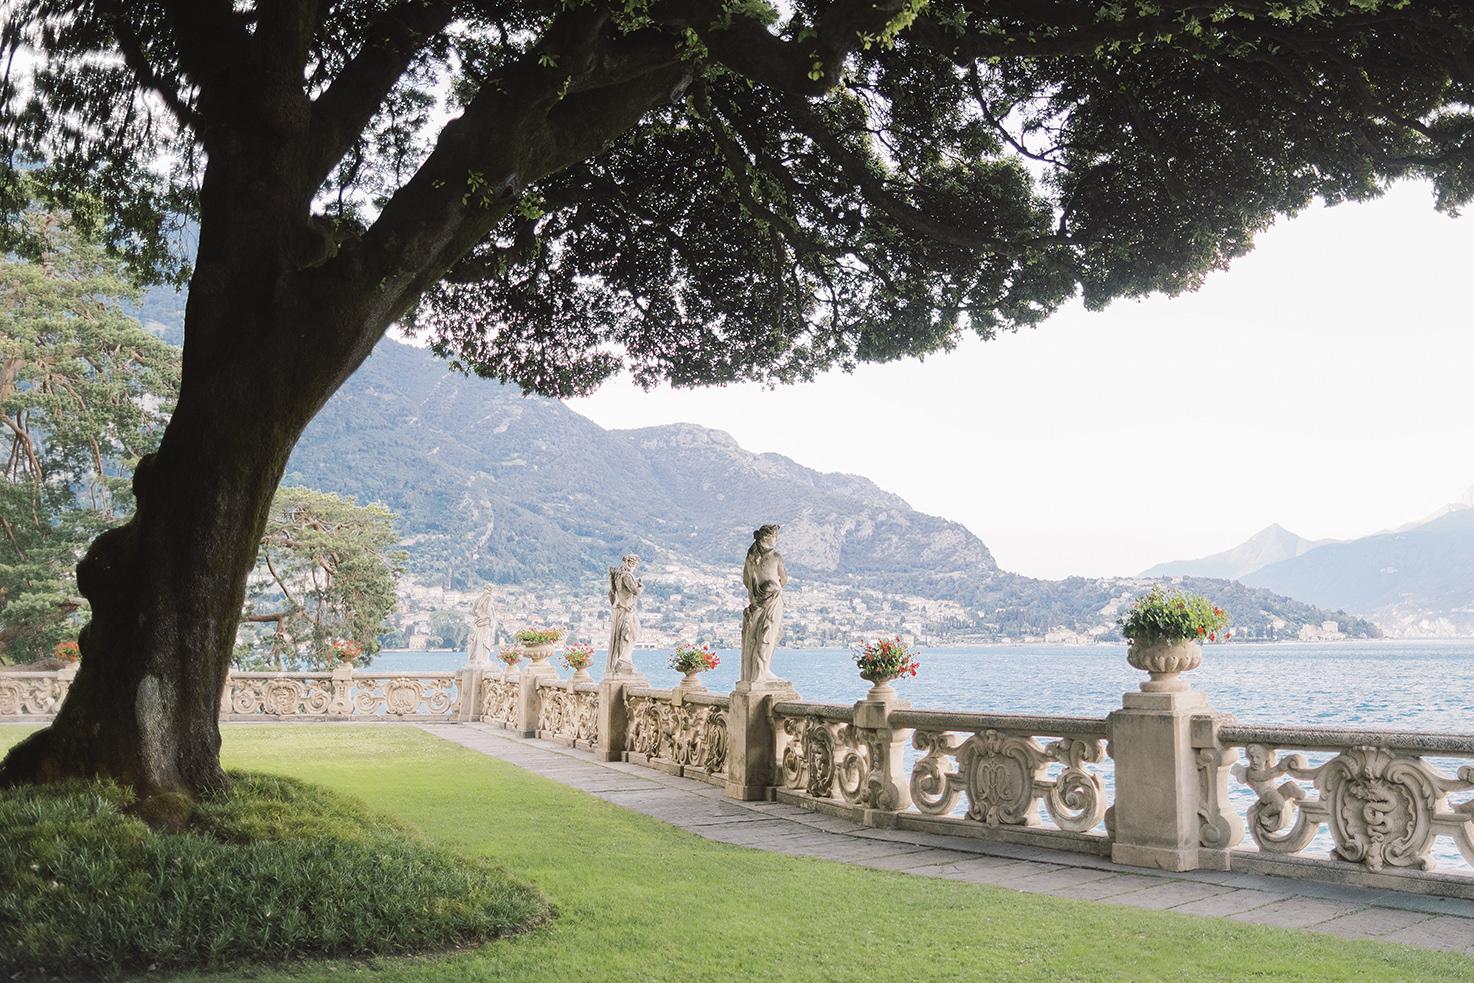 Panorama of Lake Como